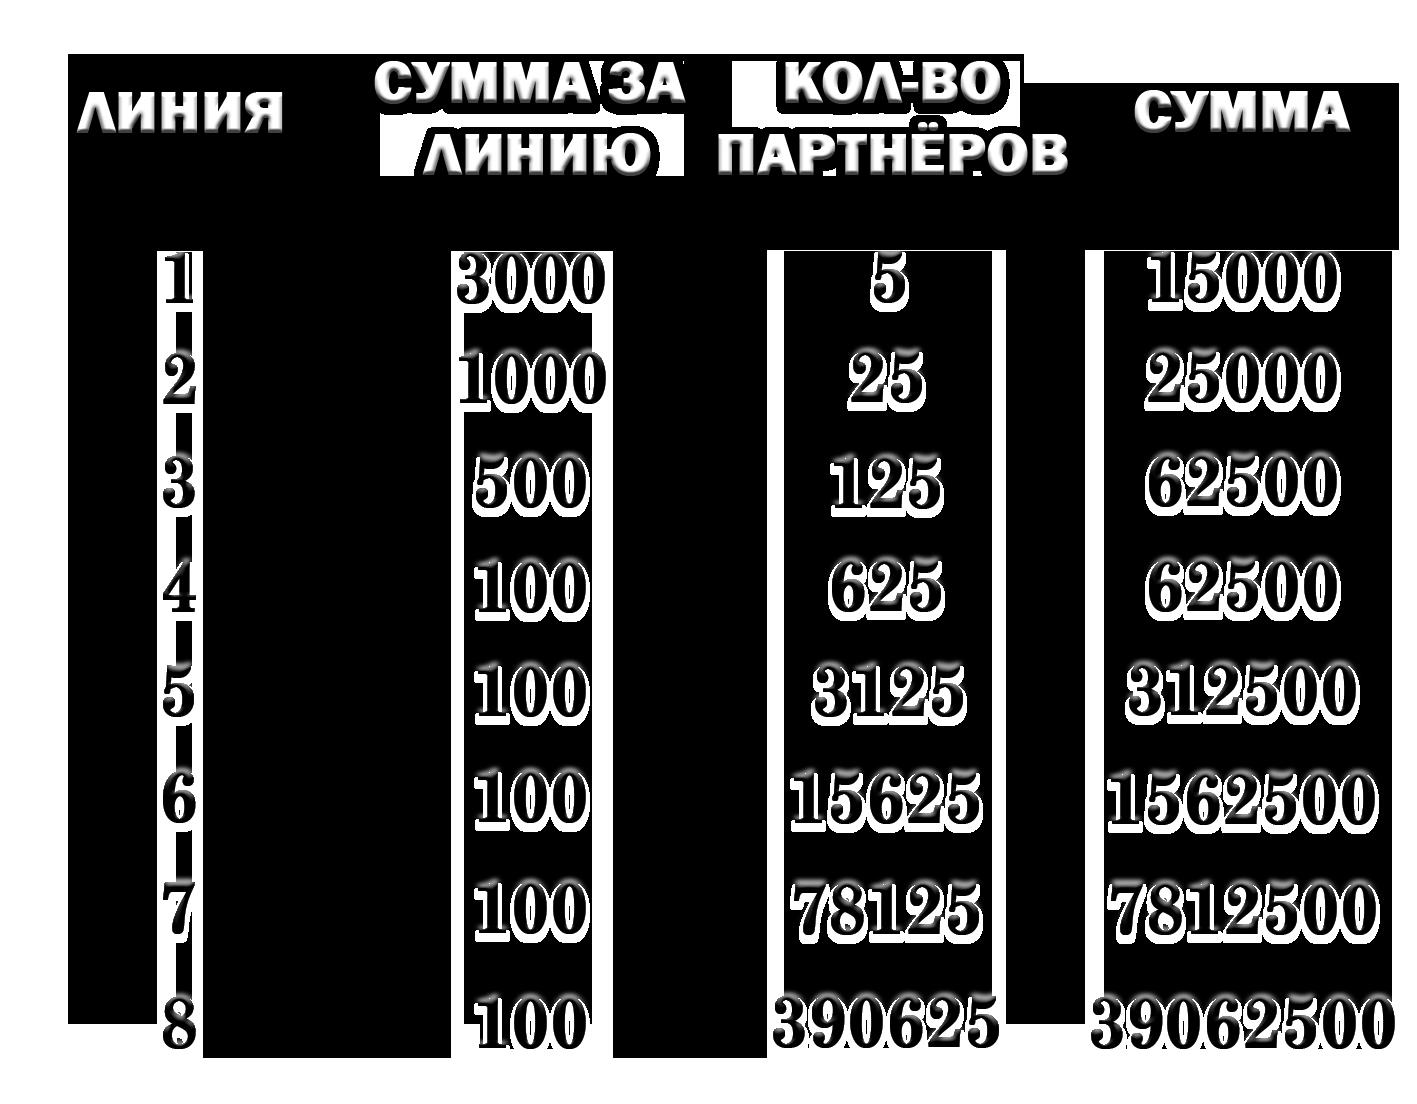 http://optimizaciya.ucoz.ru/tablica_marketing_2.png